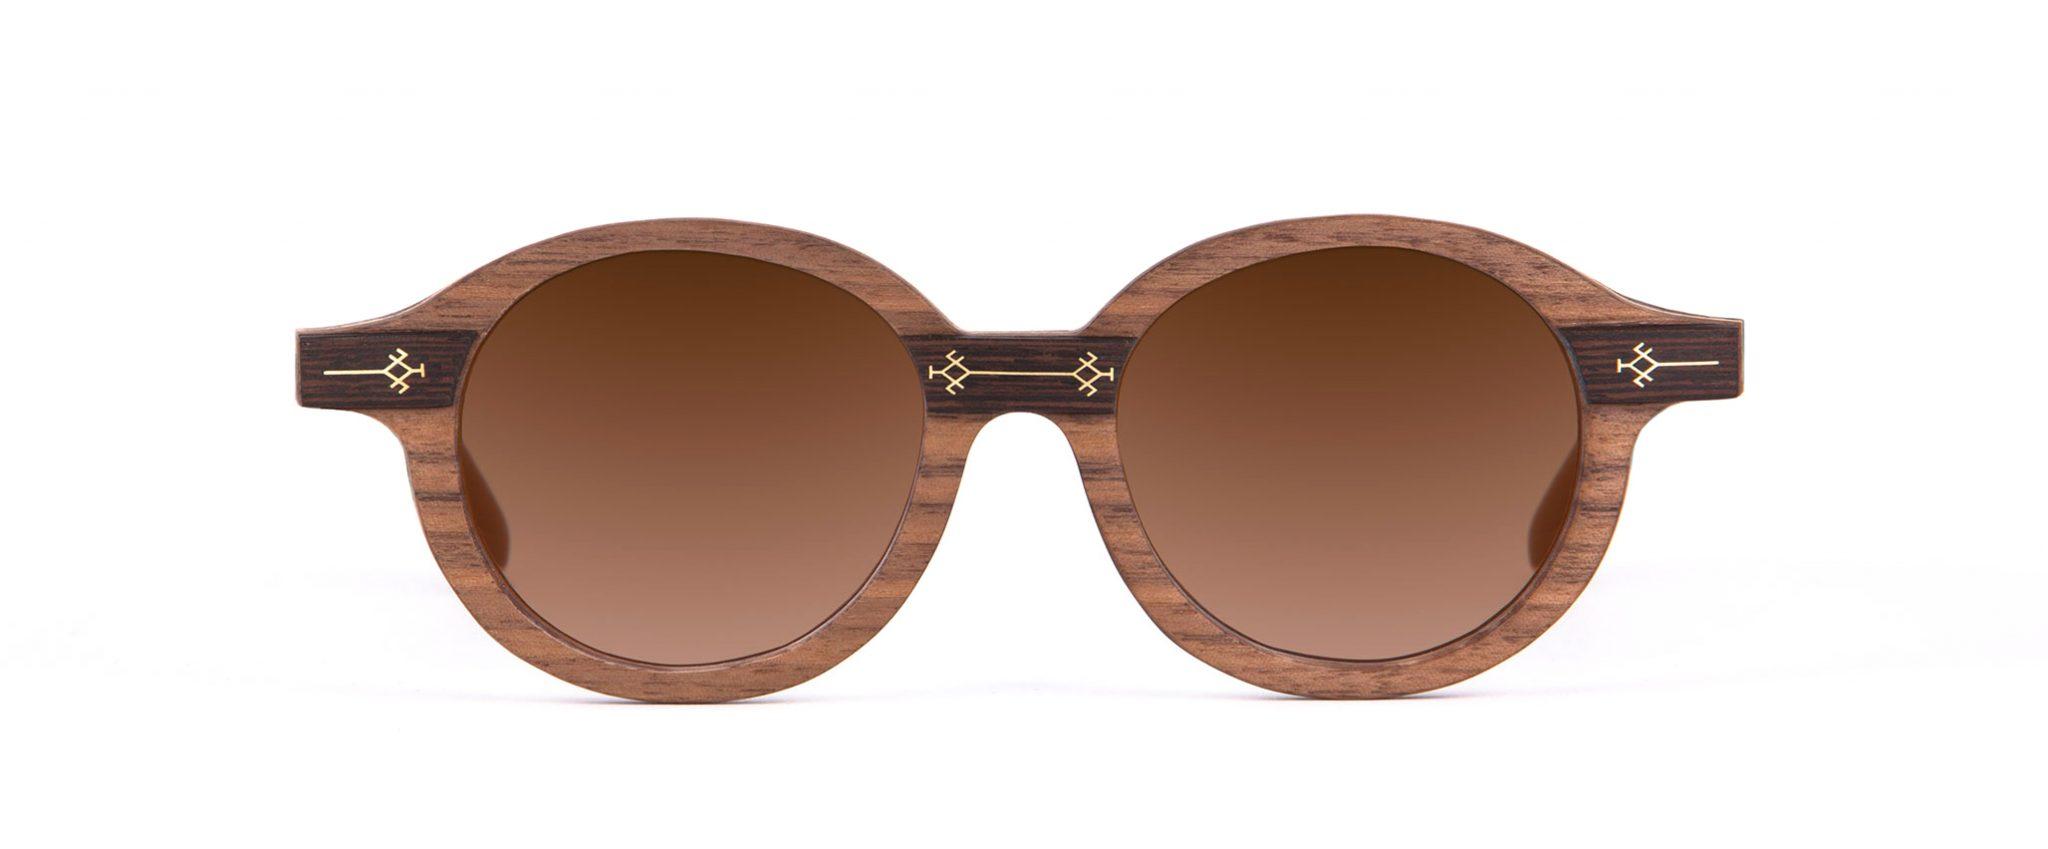 Gaya Round Designer Sunglasses